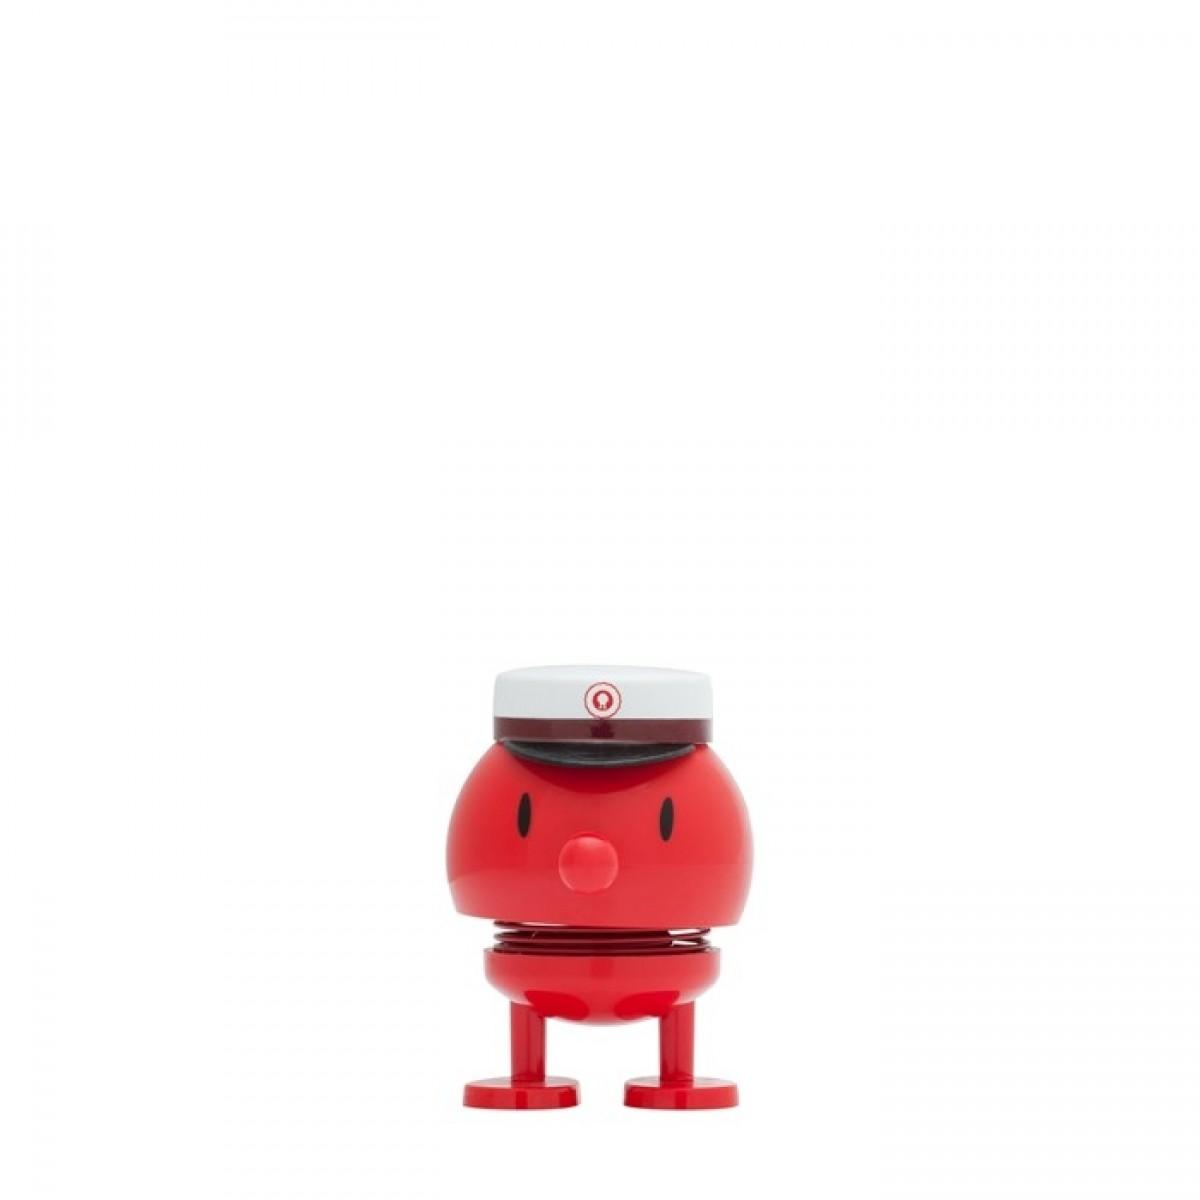 HOPTIMIST Student bumle rød 7 cm